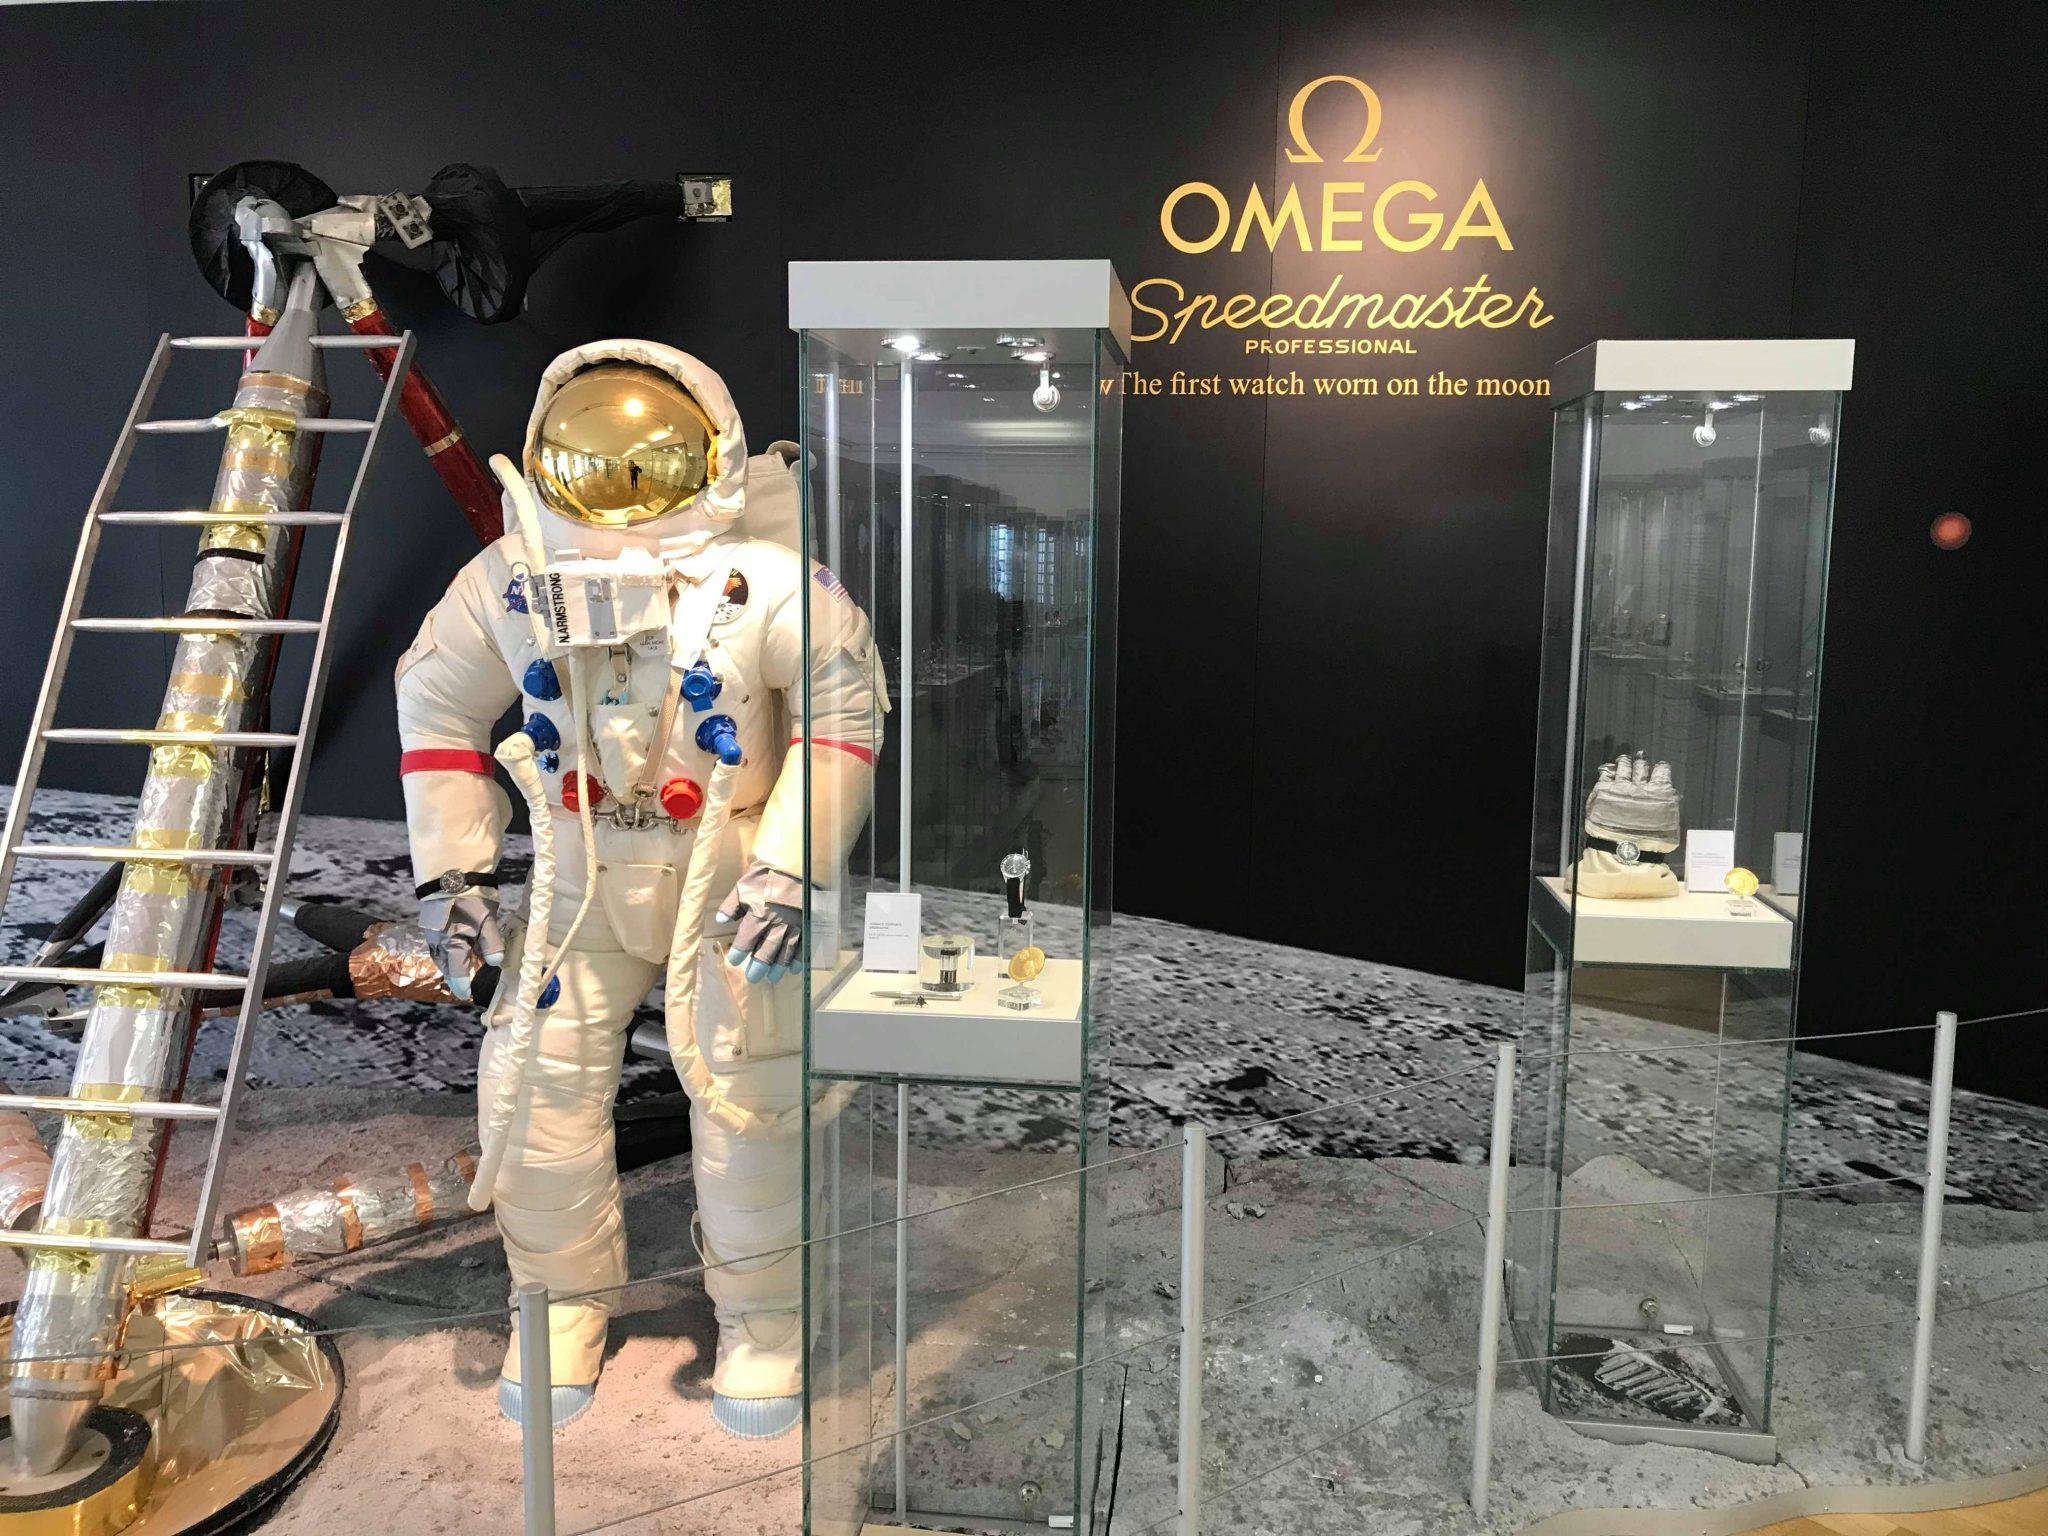 Speedmaster Moonwatch, Omega Museum, Biel, Switzerland